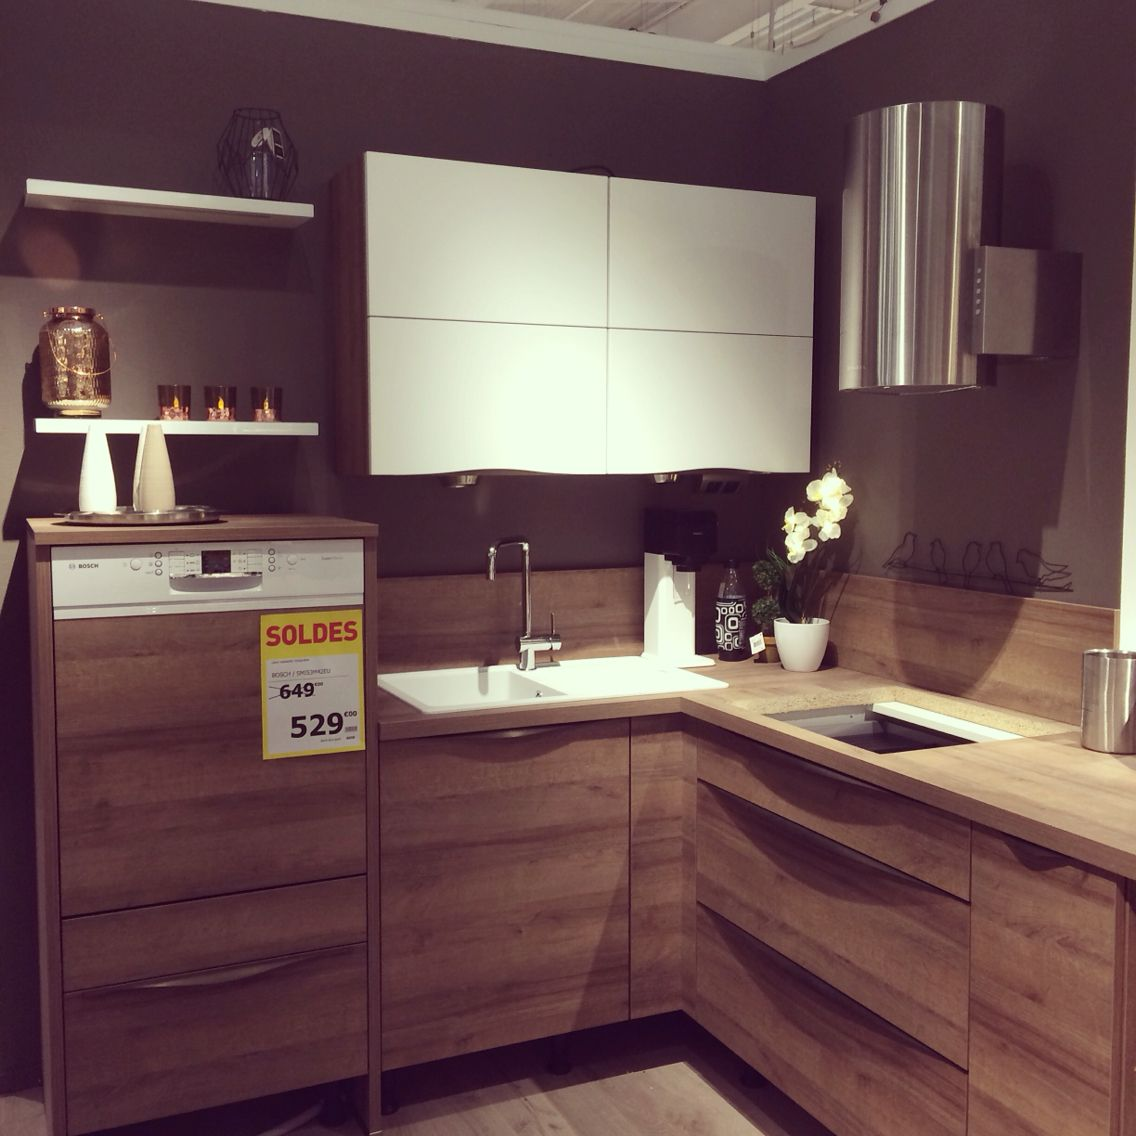 nouvelle exposition en magasin rocka ch ne ontario avec meuble haut en fa ade blanc mat. Black Bedroom Furniture Sets. Home Design Ideas